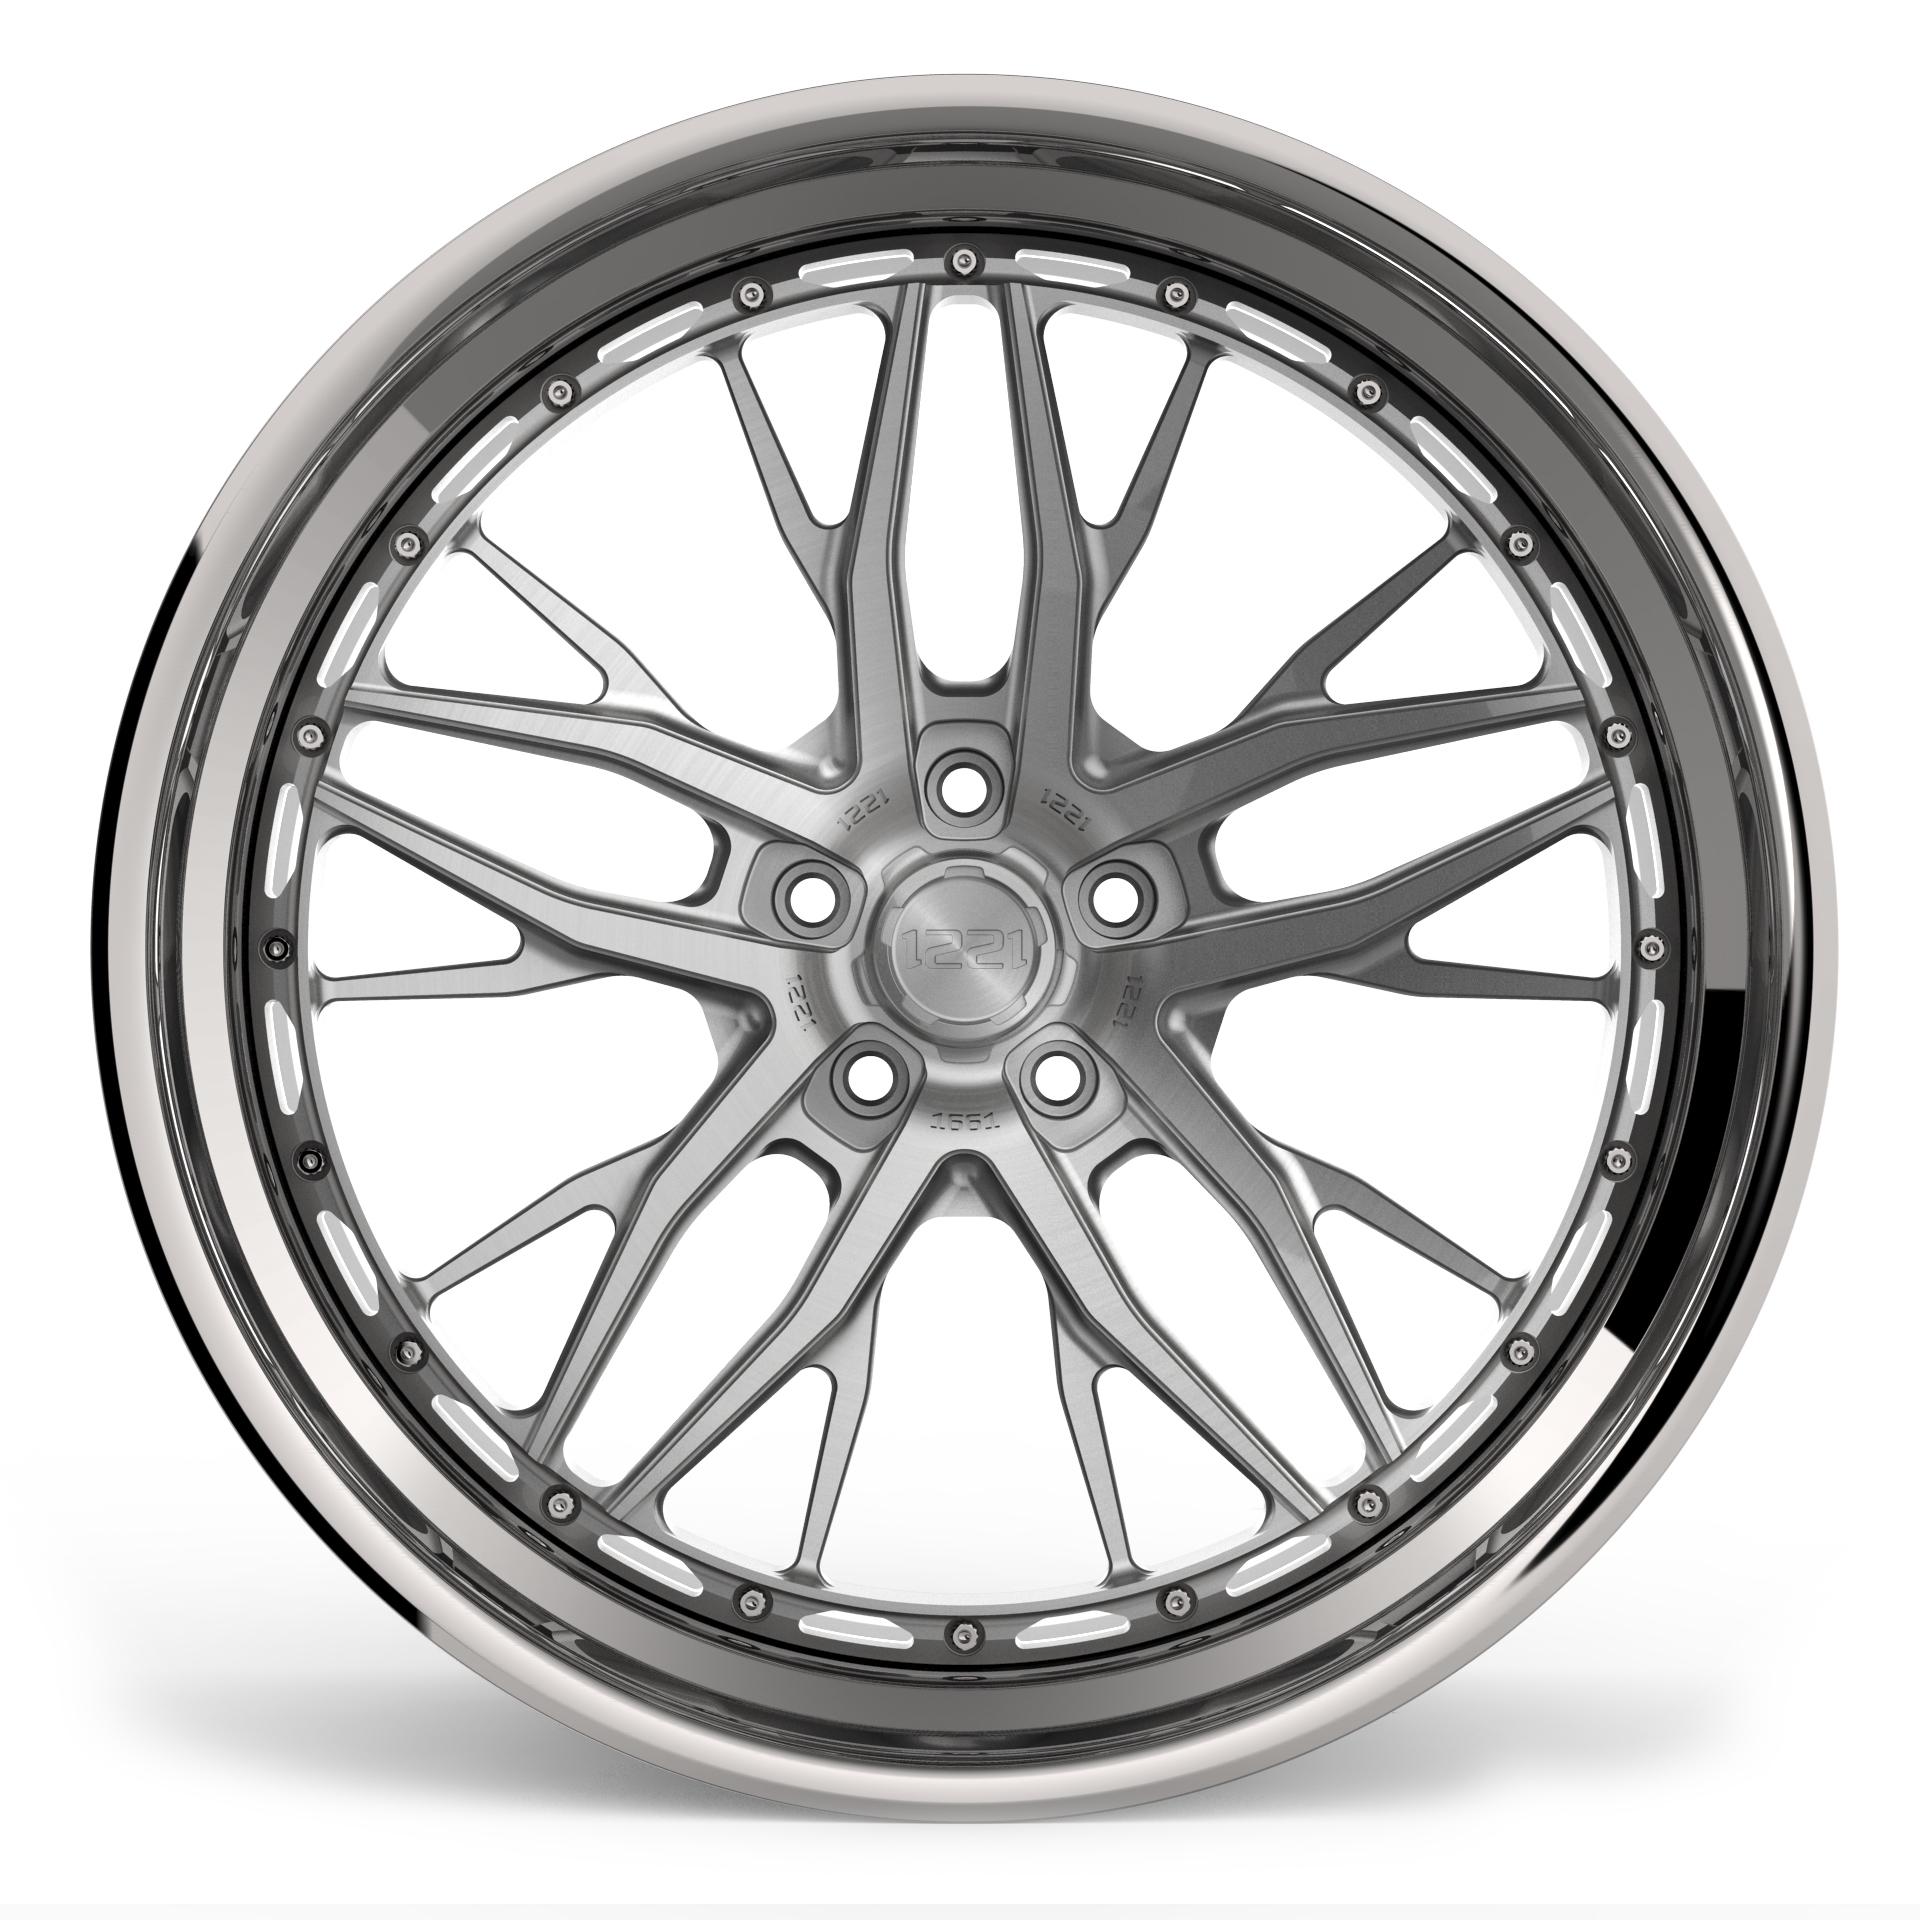 1221 Wheels 1661 AP3X APEX3.0 forged wheels